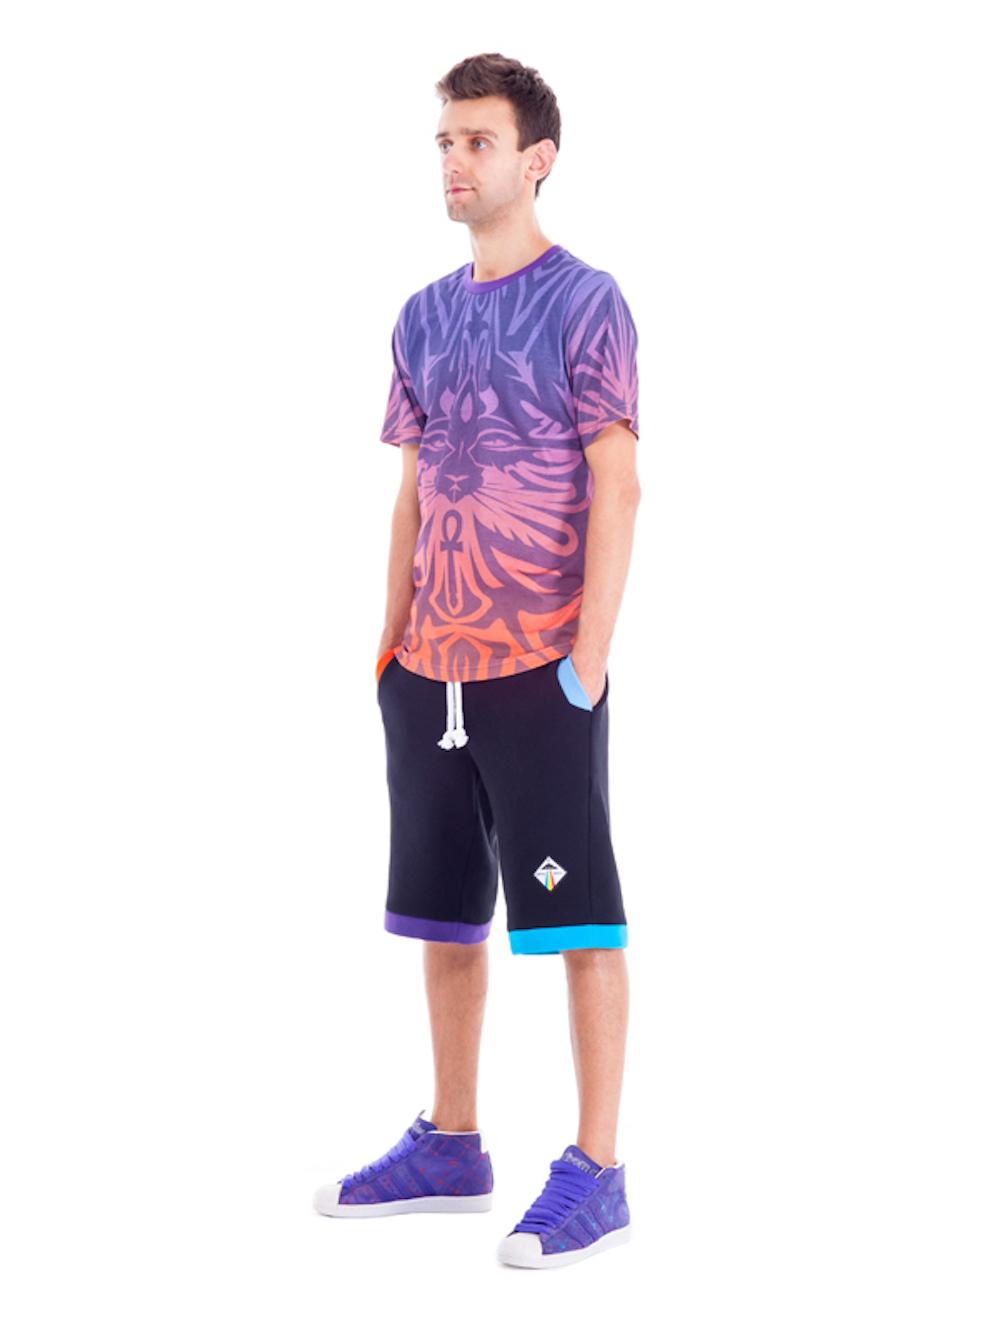 Serpens Shorts (Black) - Okuaku